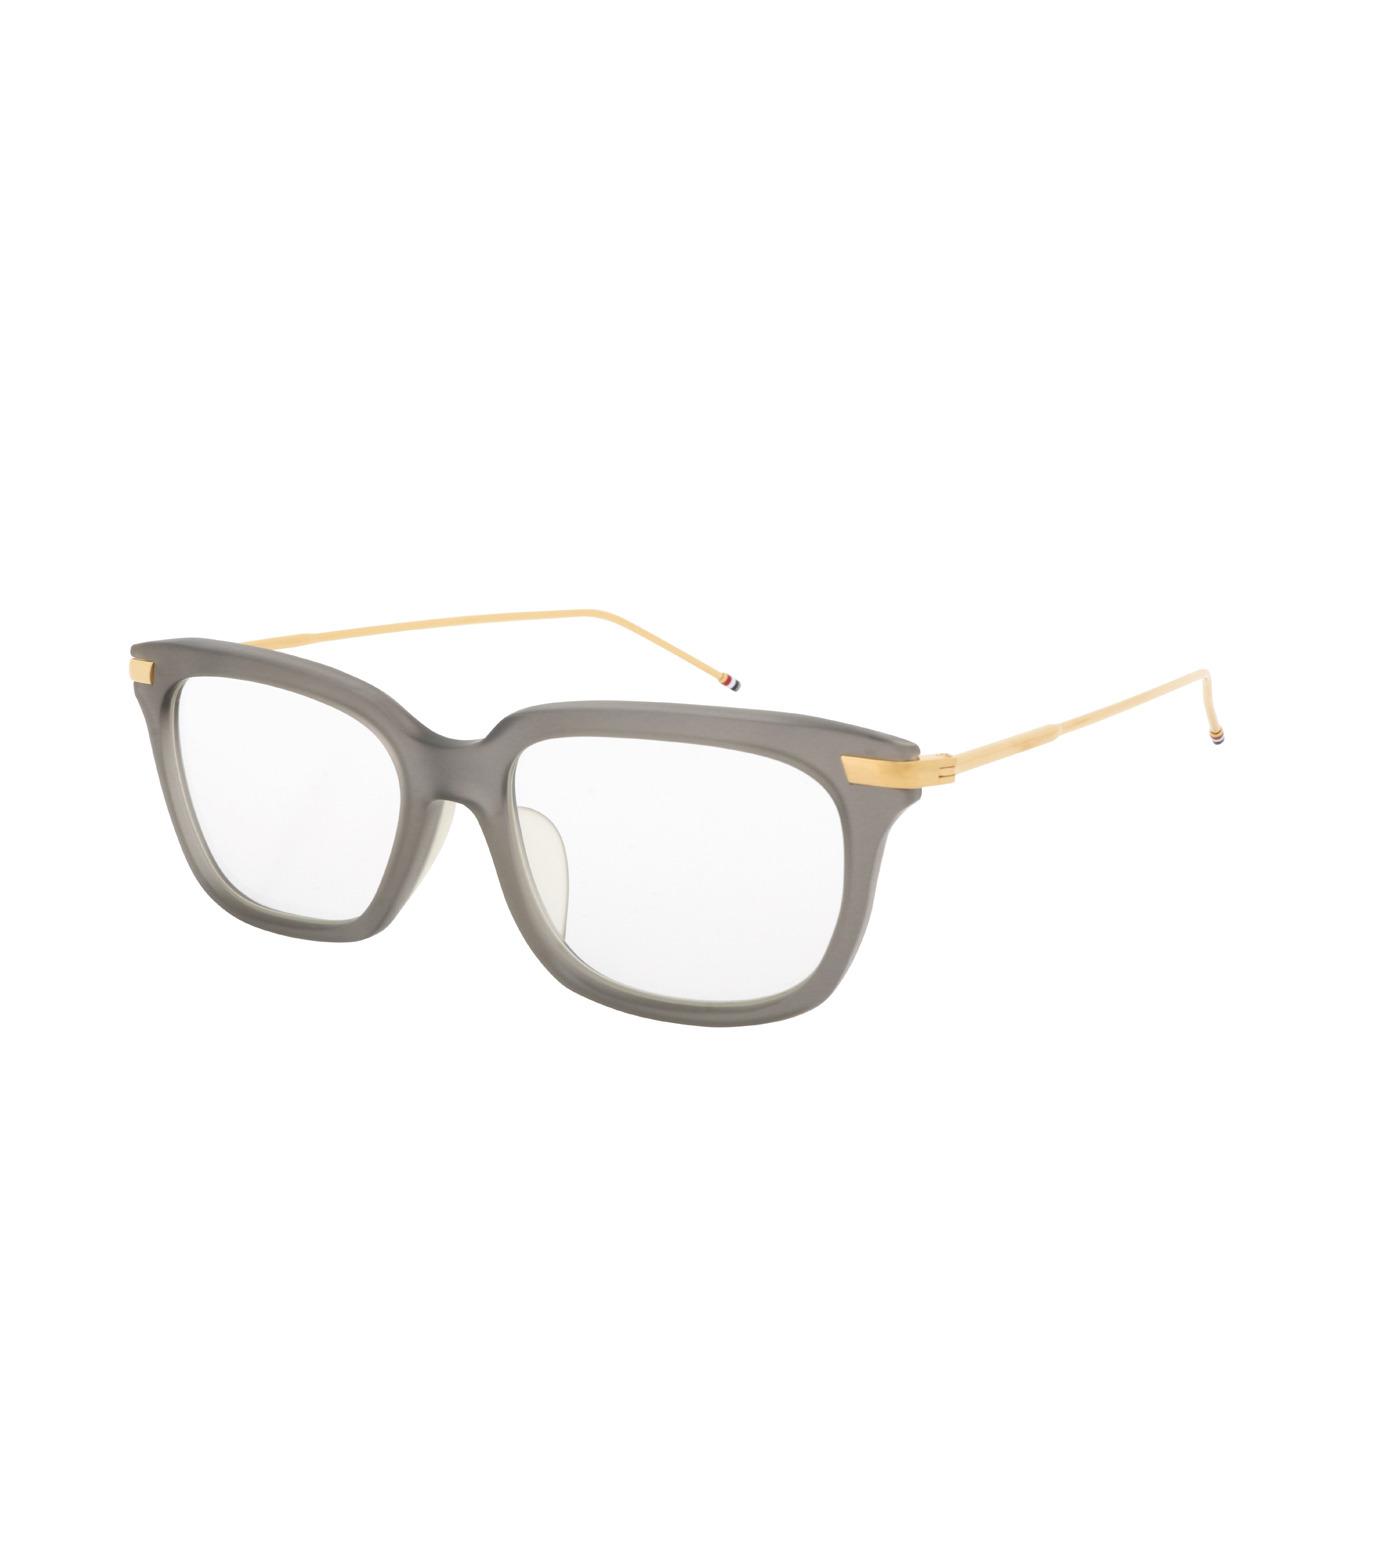 Thom Browne Eye Wear(トム・ブラウン・アイウェア)のWellington Clear Lens-GRAY(アイウェア/eyewear)-TB-701-G-11 拡大詳細画像1